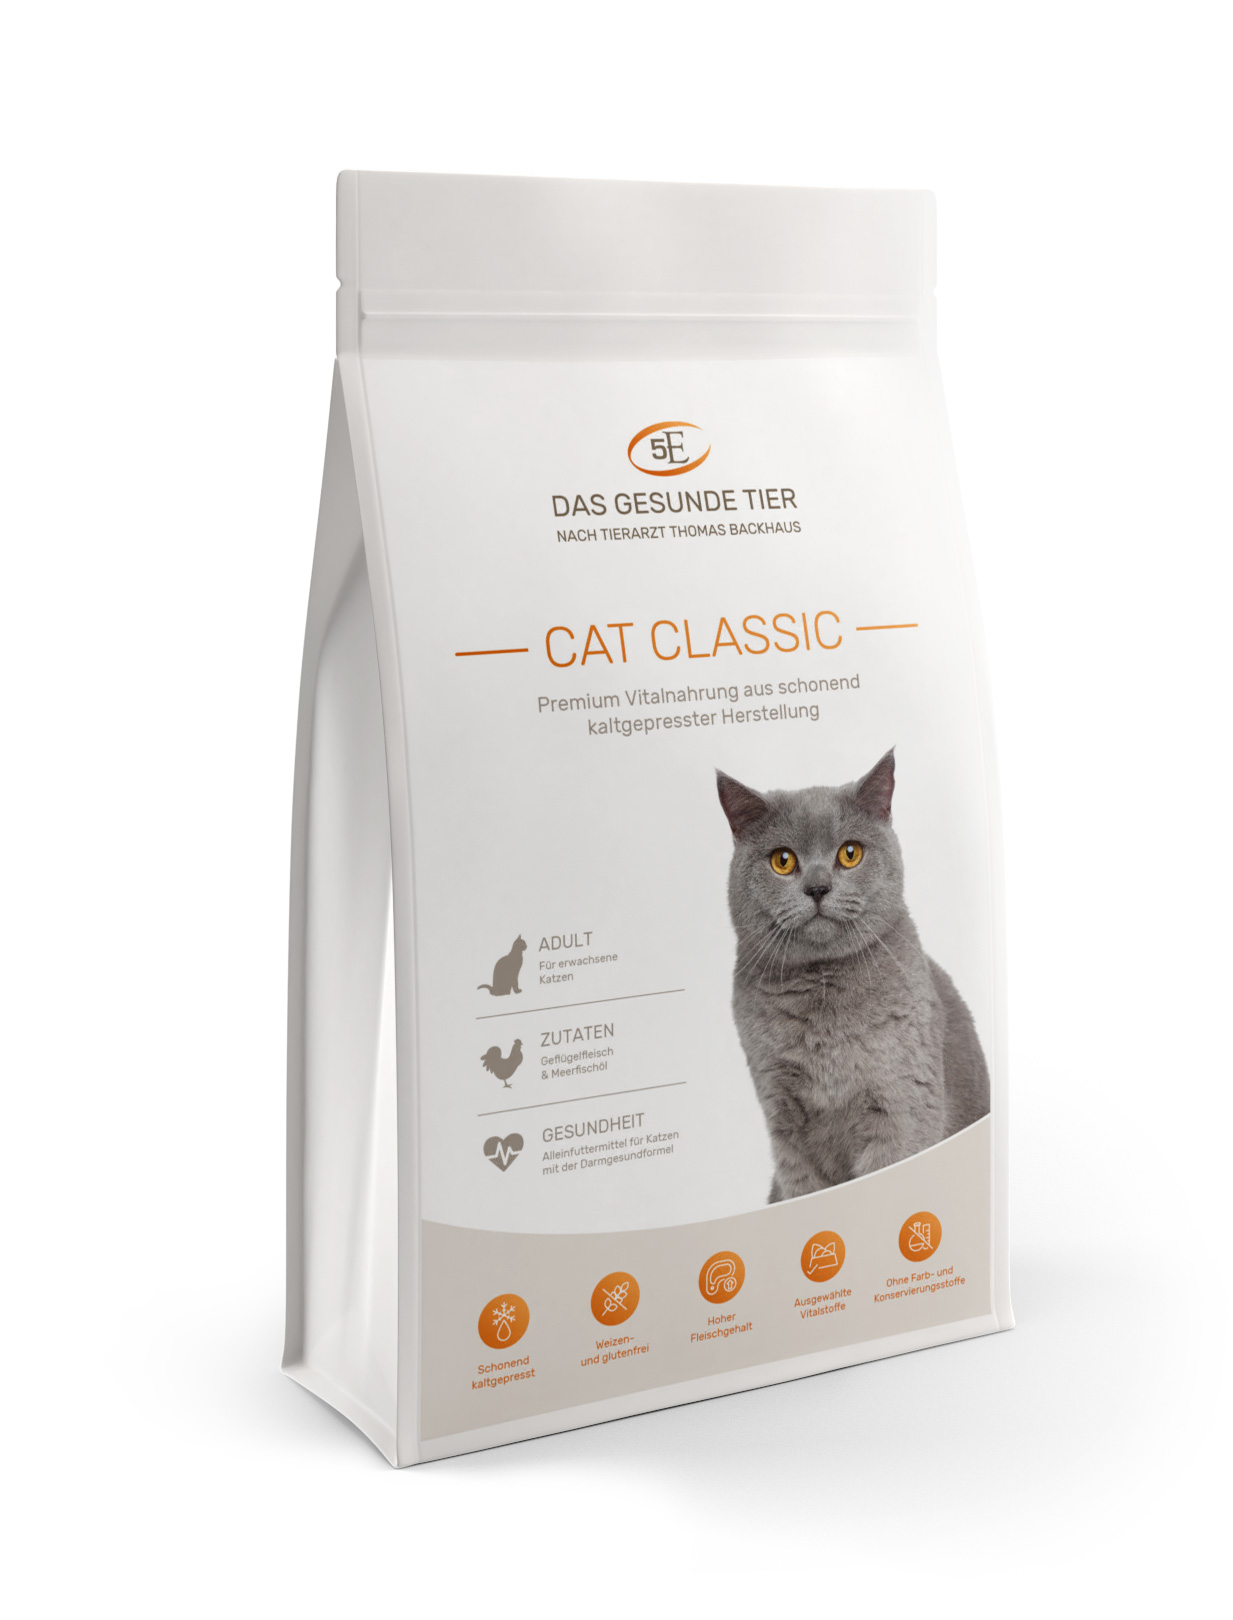 5 e kaltgepresstes katzenfutter cat classic 10 kg neu. Black Bedroom Furniture Sets. Home Design Ideas